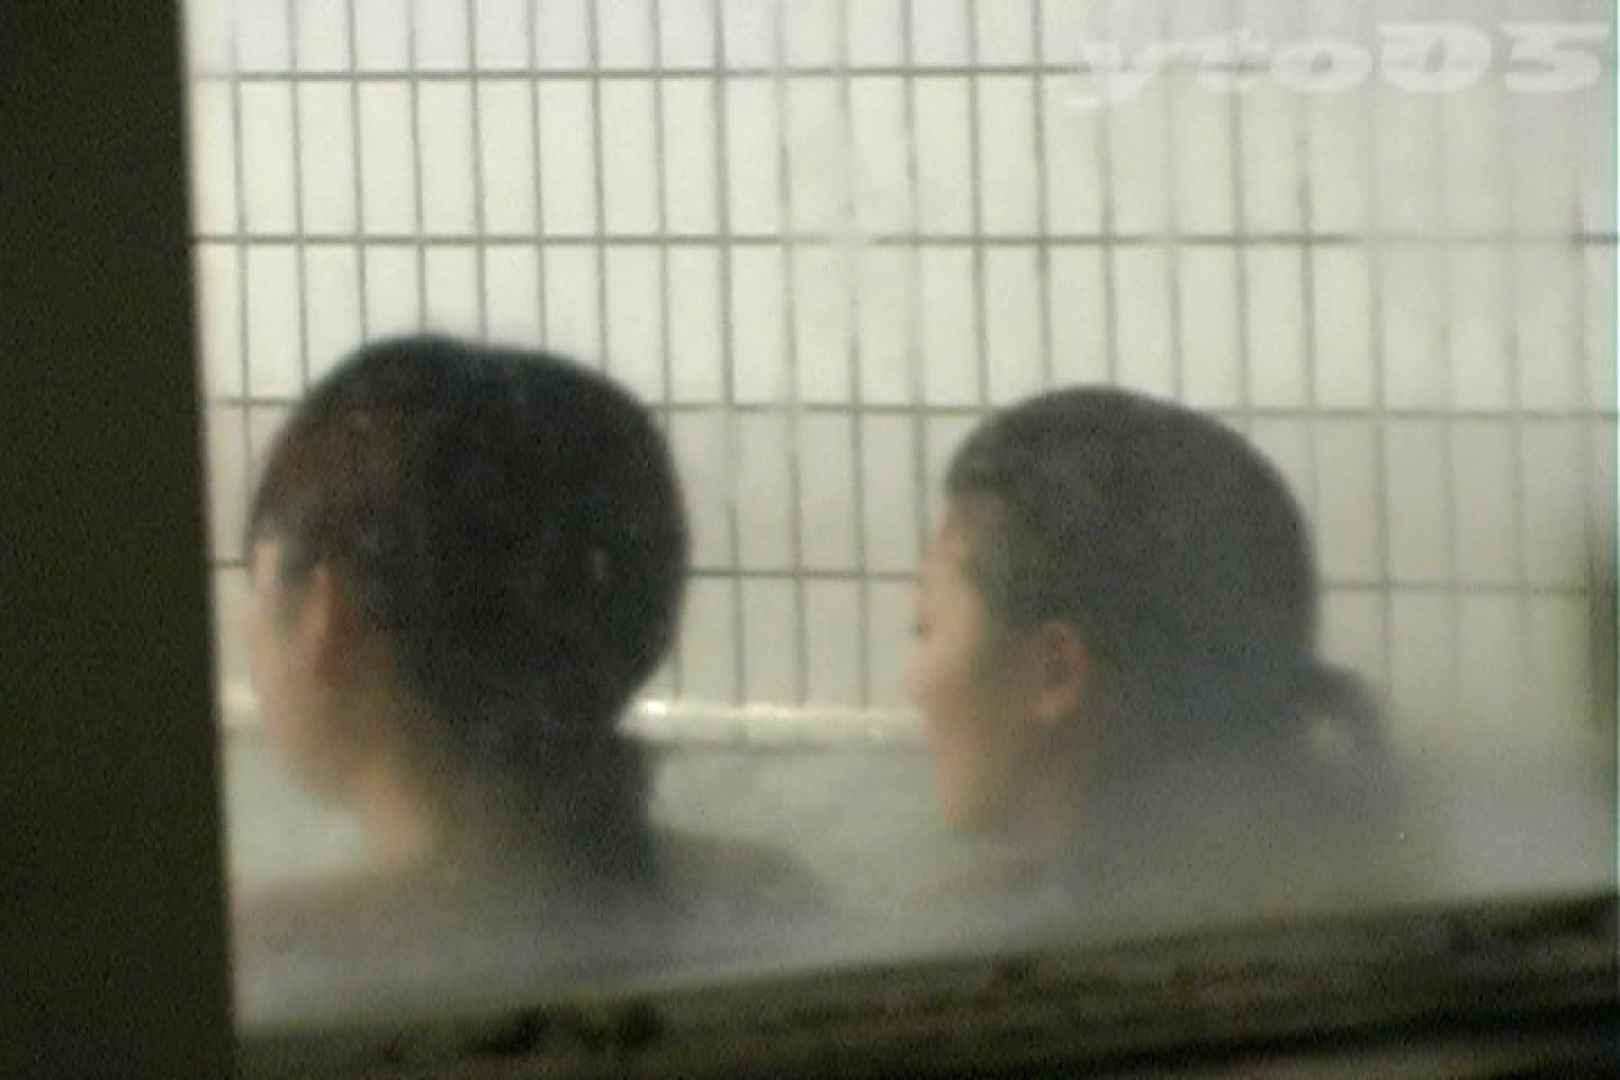 ▲復活限定▲合宿ホテル女風呂盗撮 Vol.31